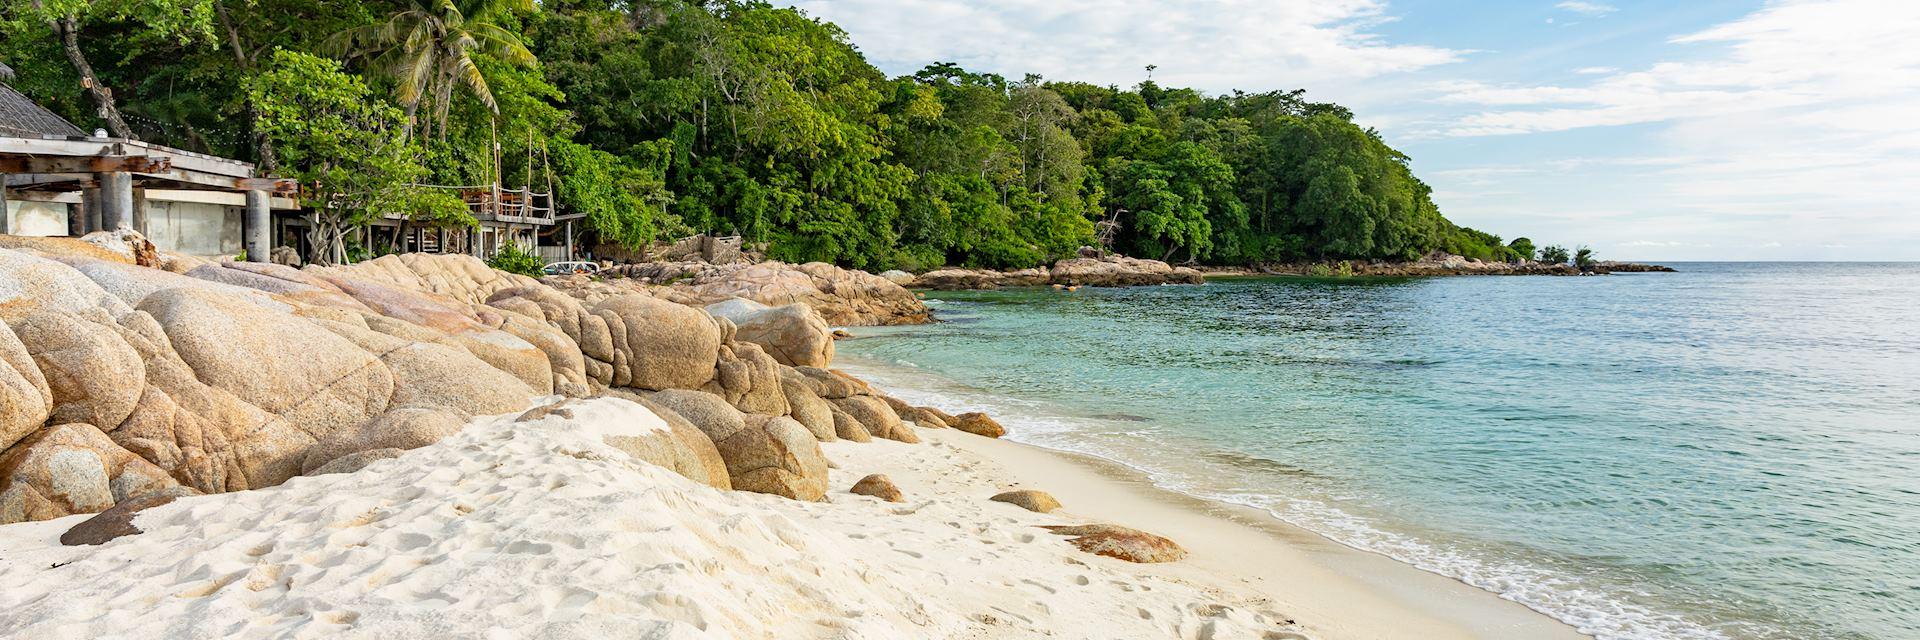 White sand beach on Koh Munnork